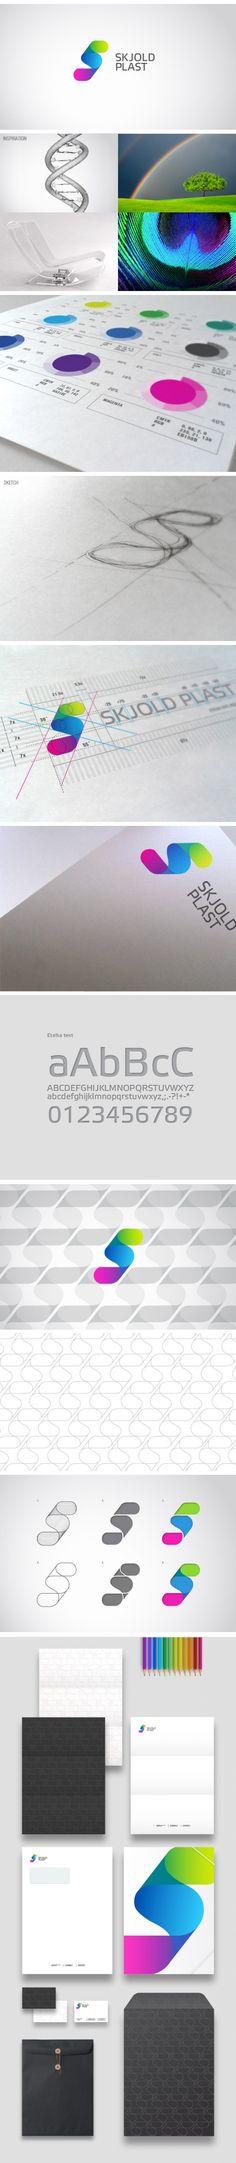 SKJOLD PLAST   #corporate #branding #creative #logo #personalized #identity #design #corporatedesign < repinned by www.BlickeDeeler.de   Have a look on www.LogoGestaltung-Hamburg.de